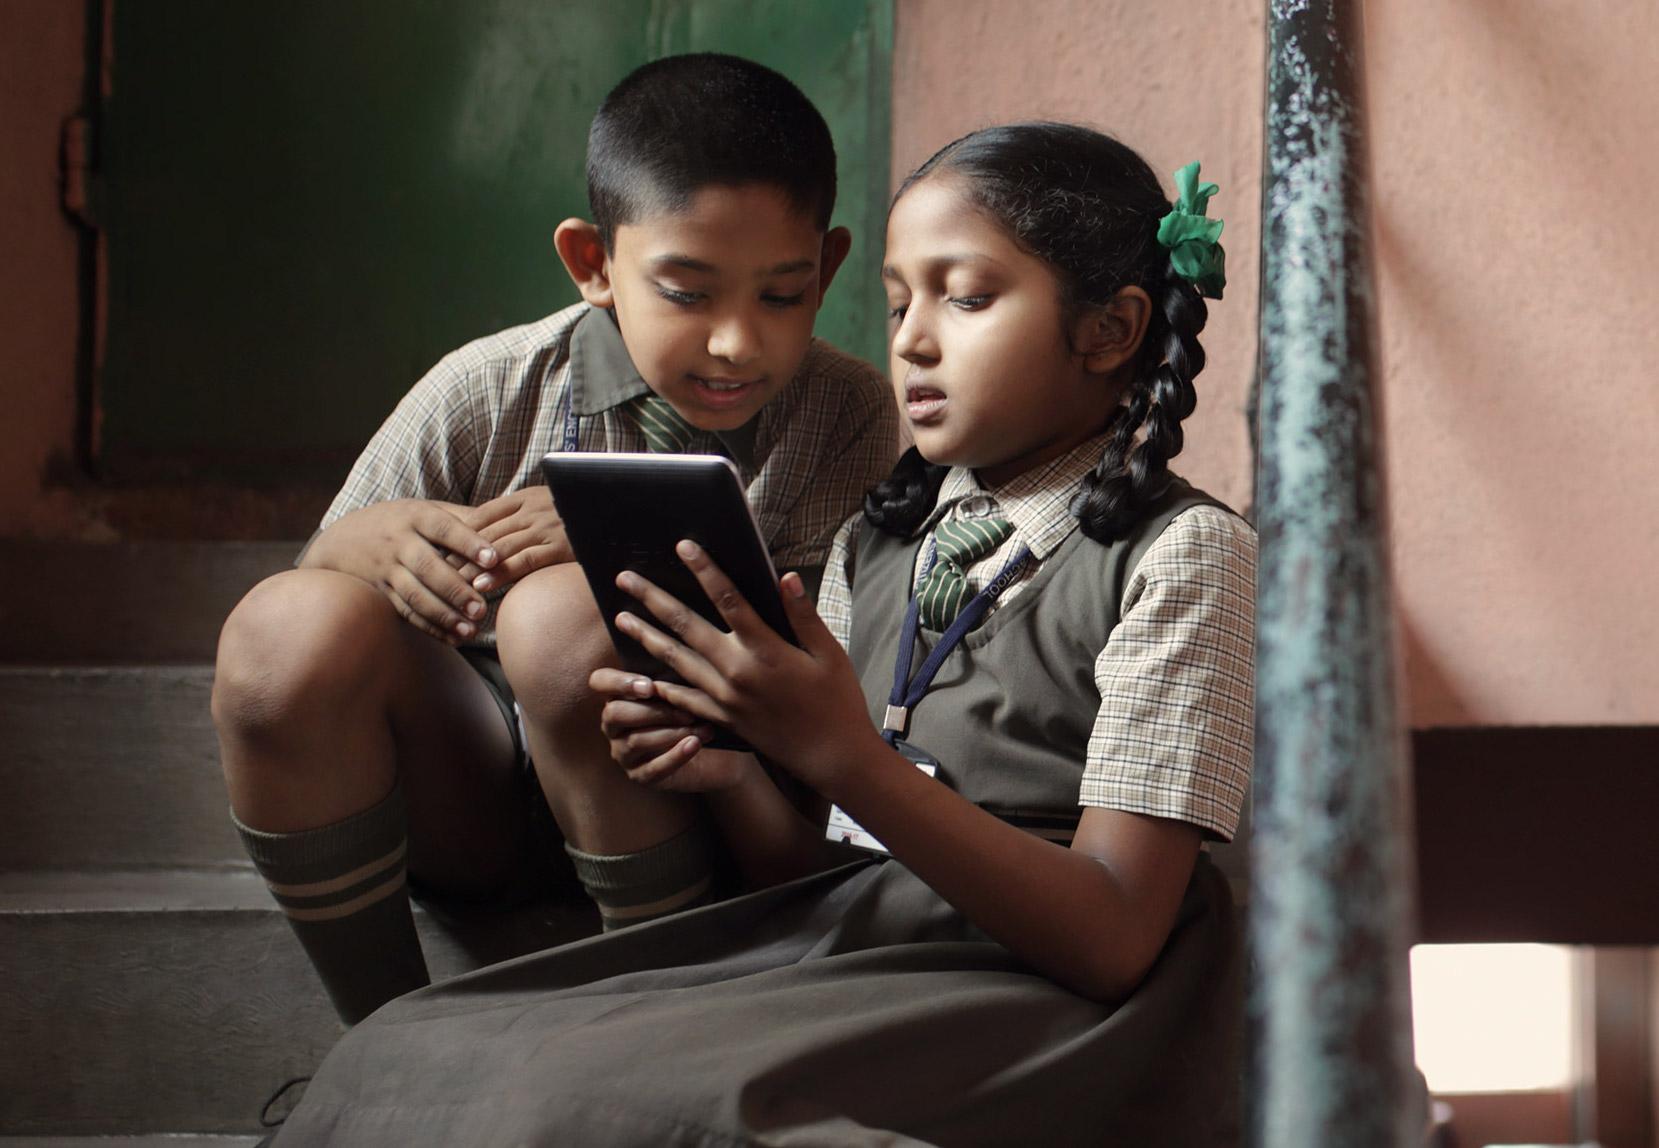 Google.org is working with Pratham Books' StoryWeaver